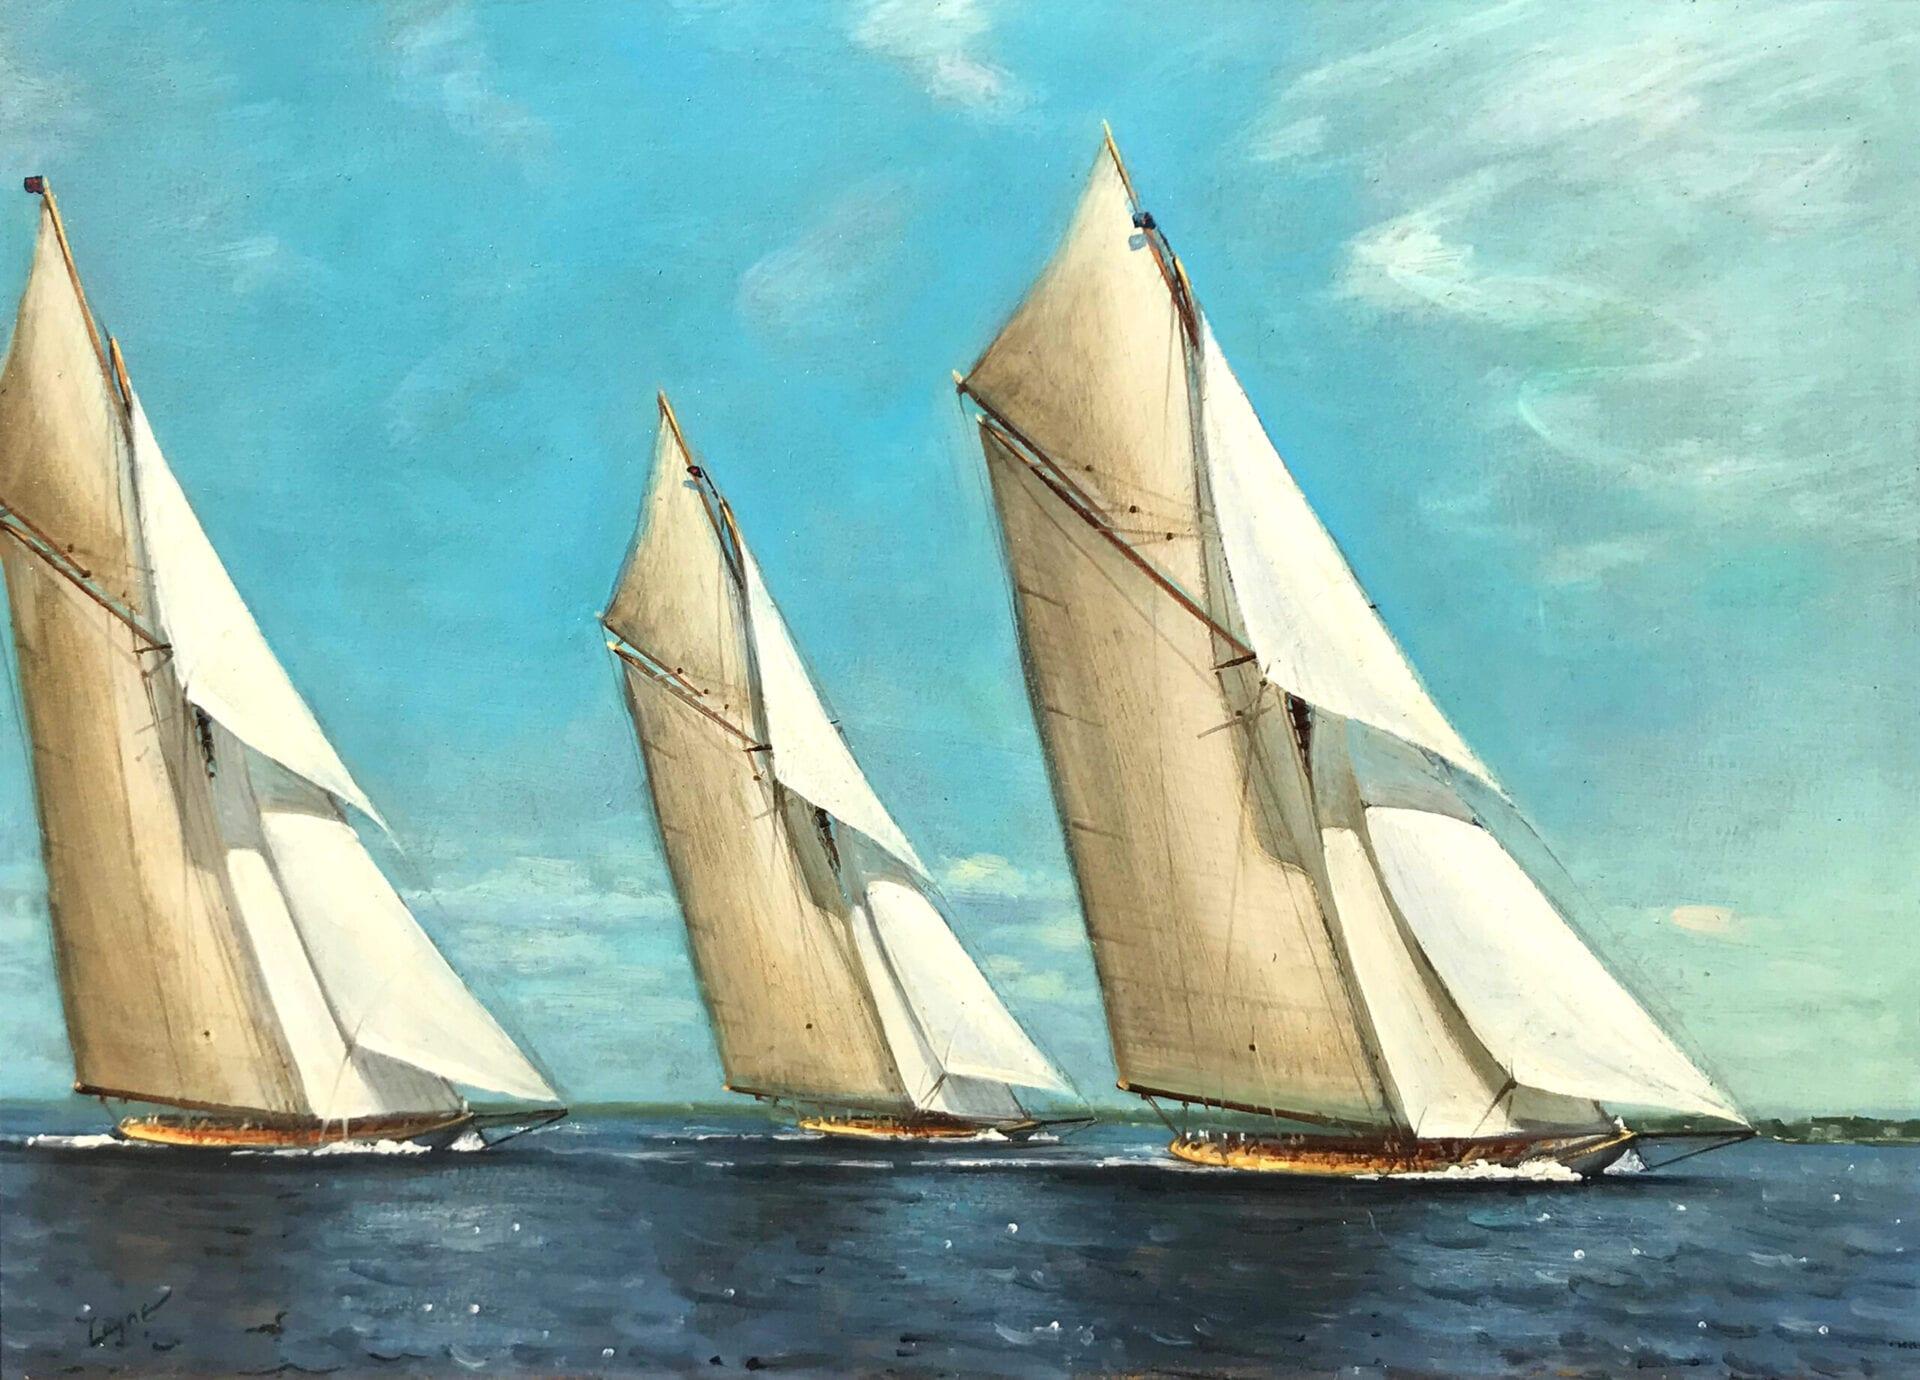 Peter Layne Arguimbau - Full Sails